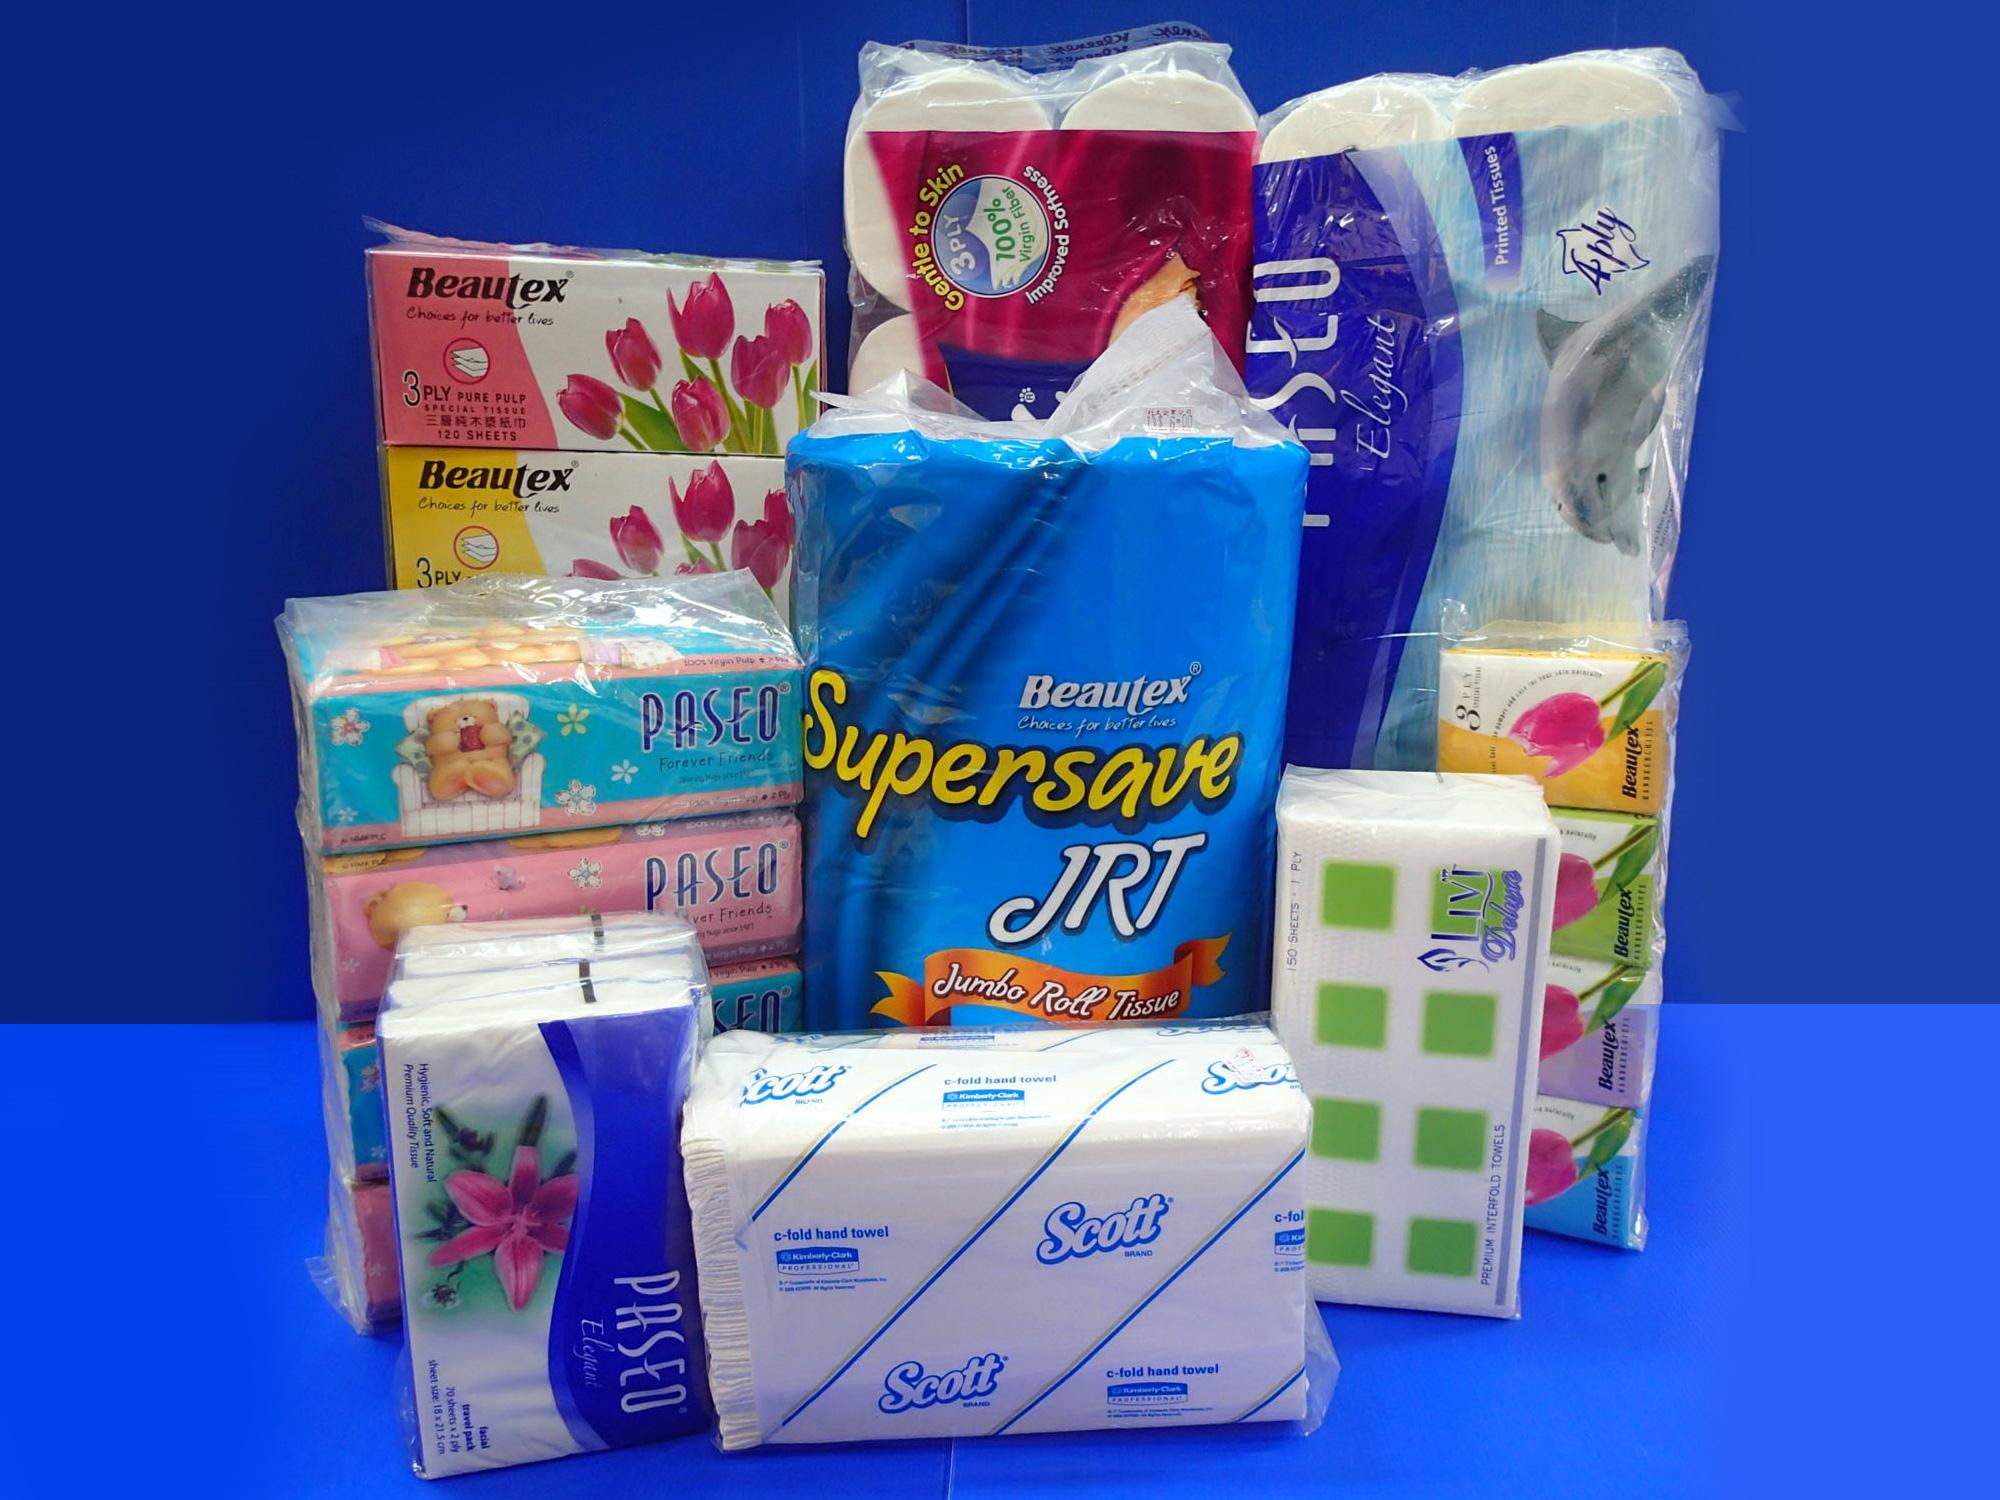 5360831bebc44254750003bf_G3-Toilet-Rolls-%26-Hand-Towels-1.jpg